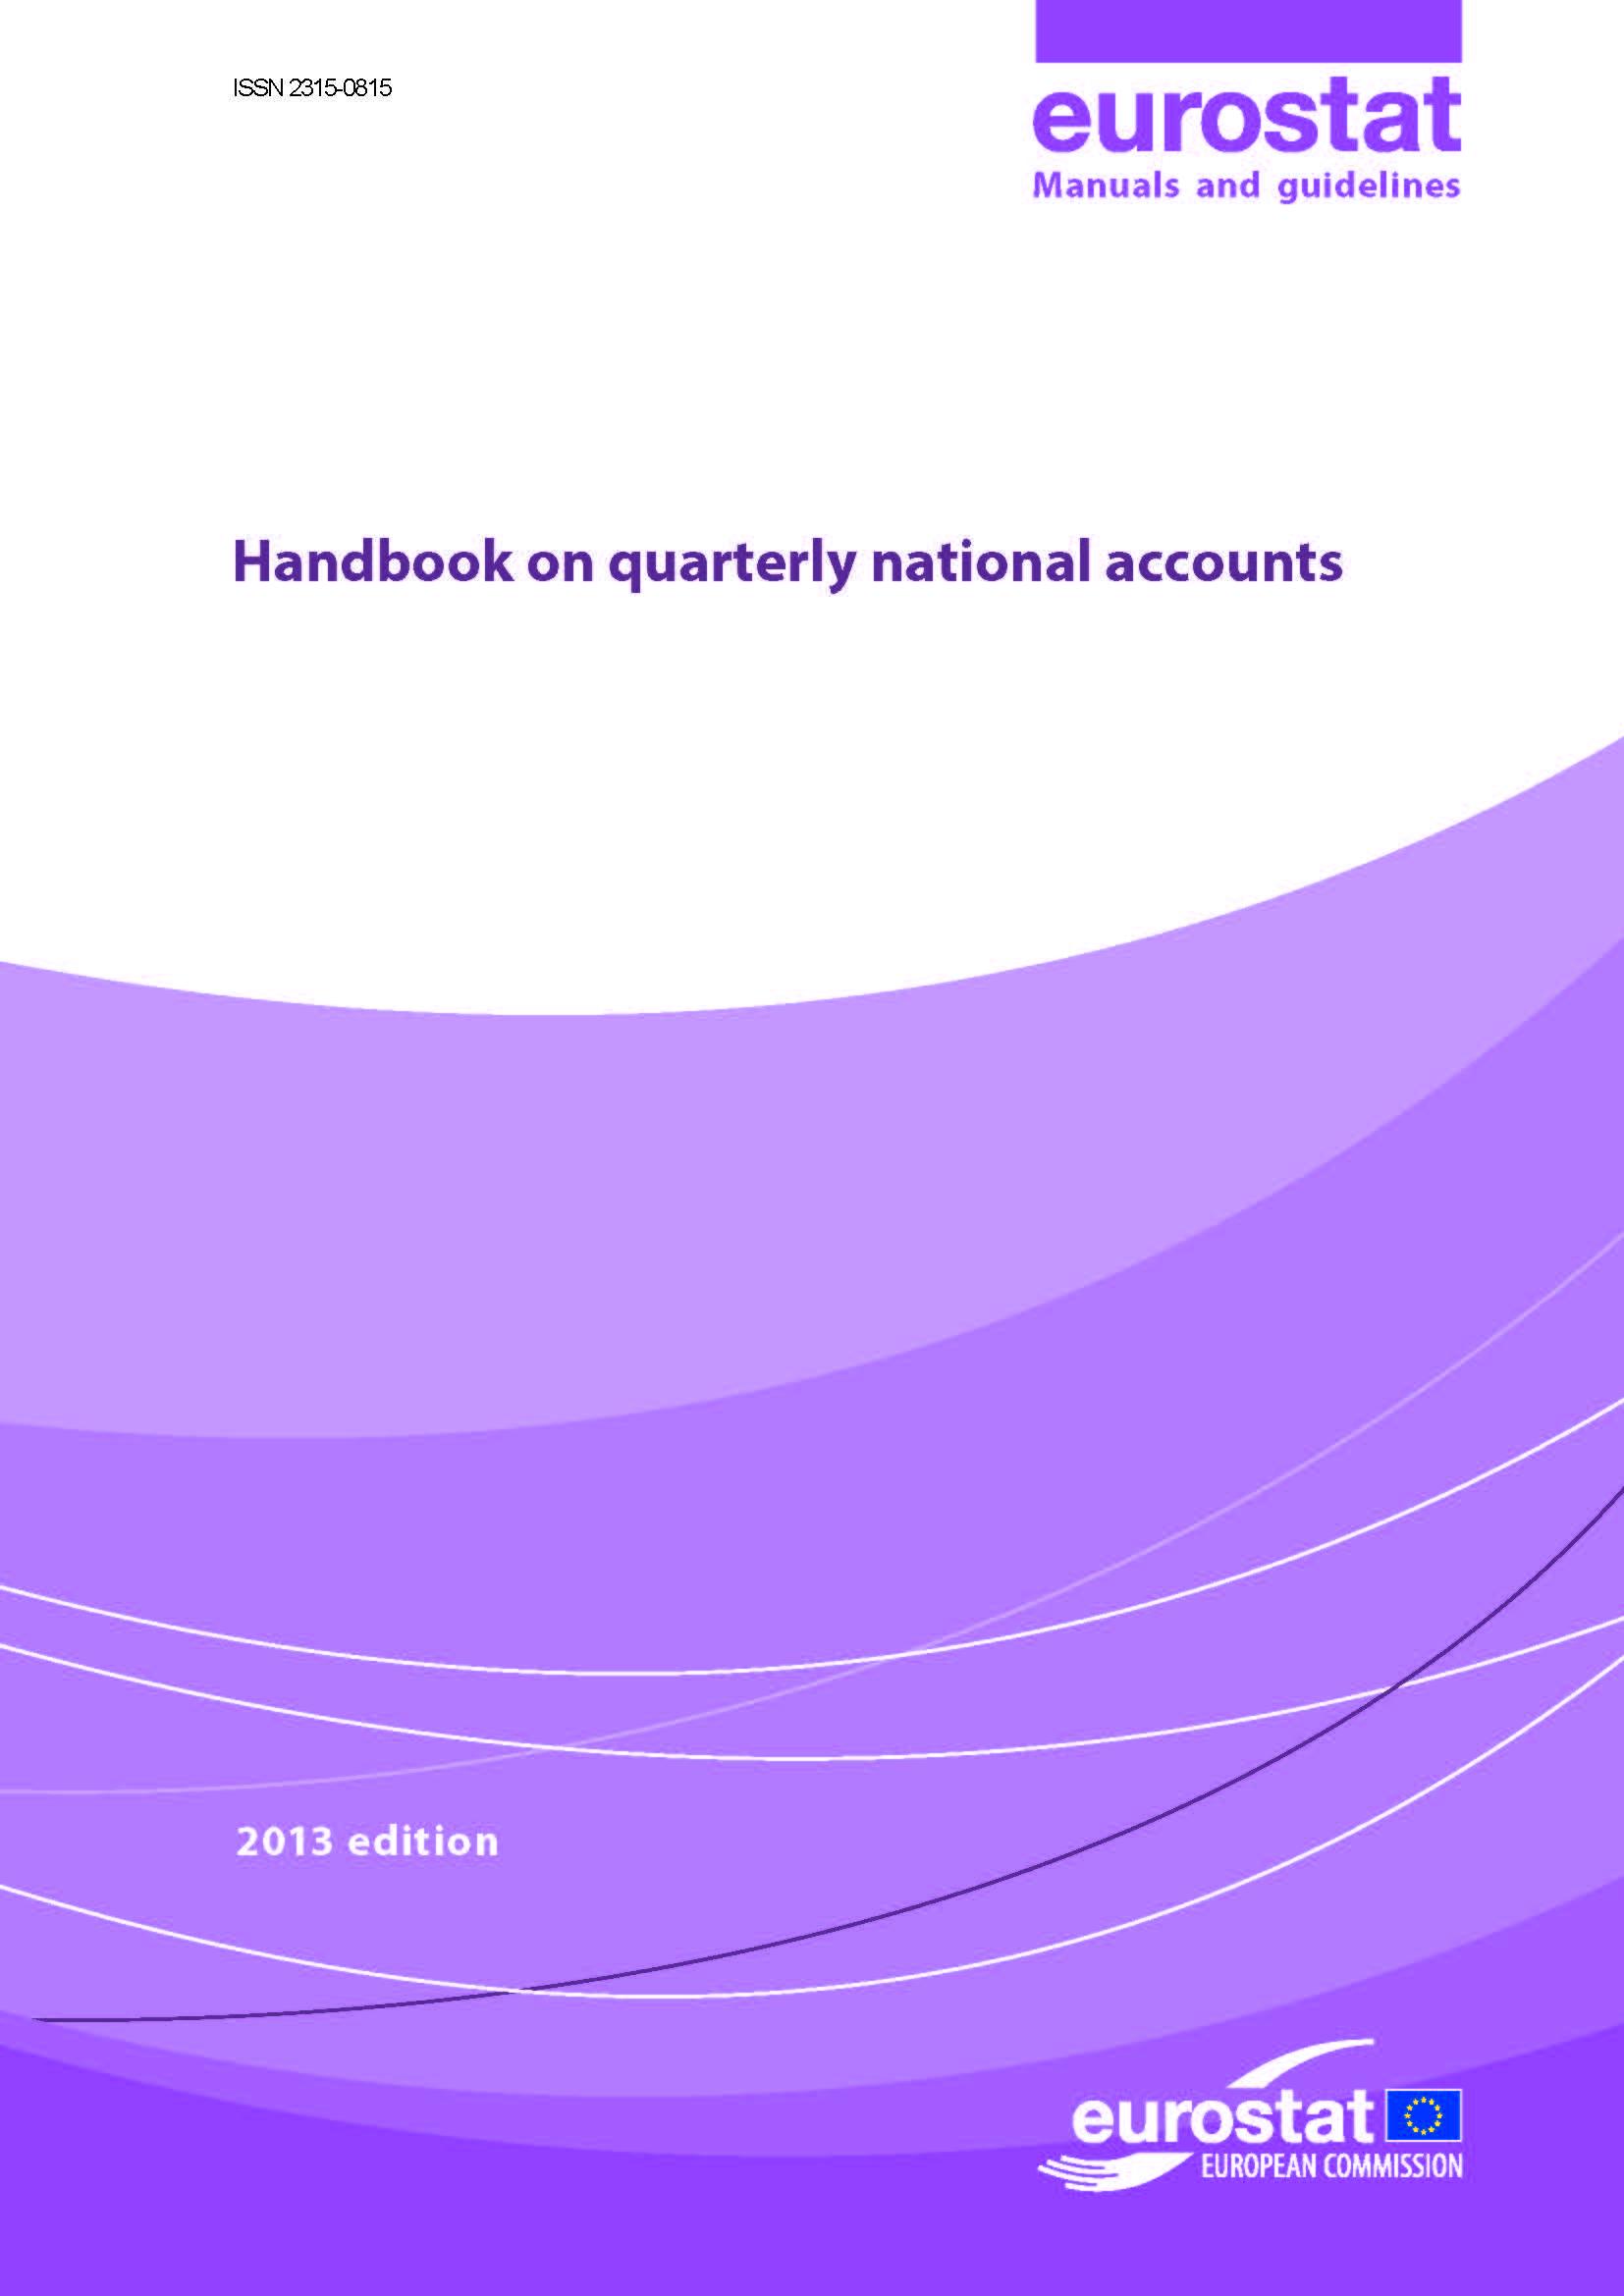 Handbook on quarterly national accounts - 2013 edition